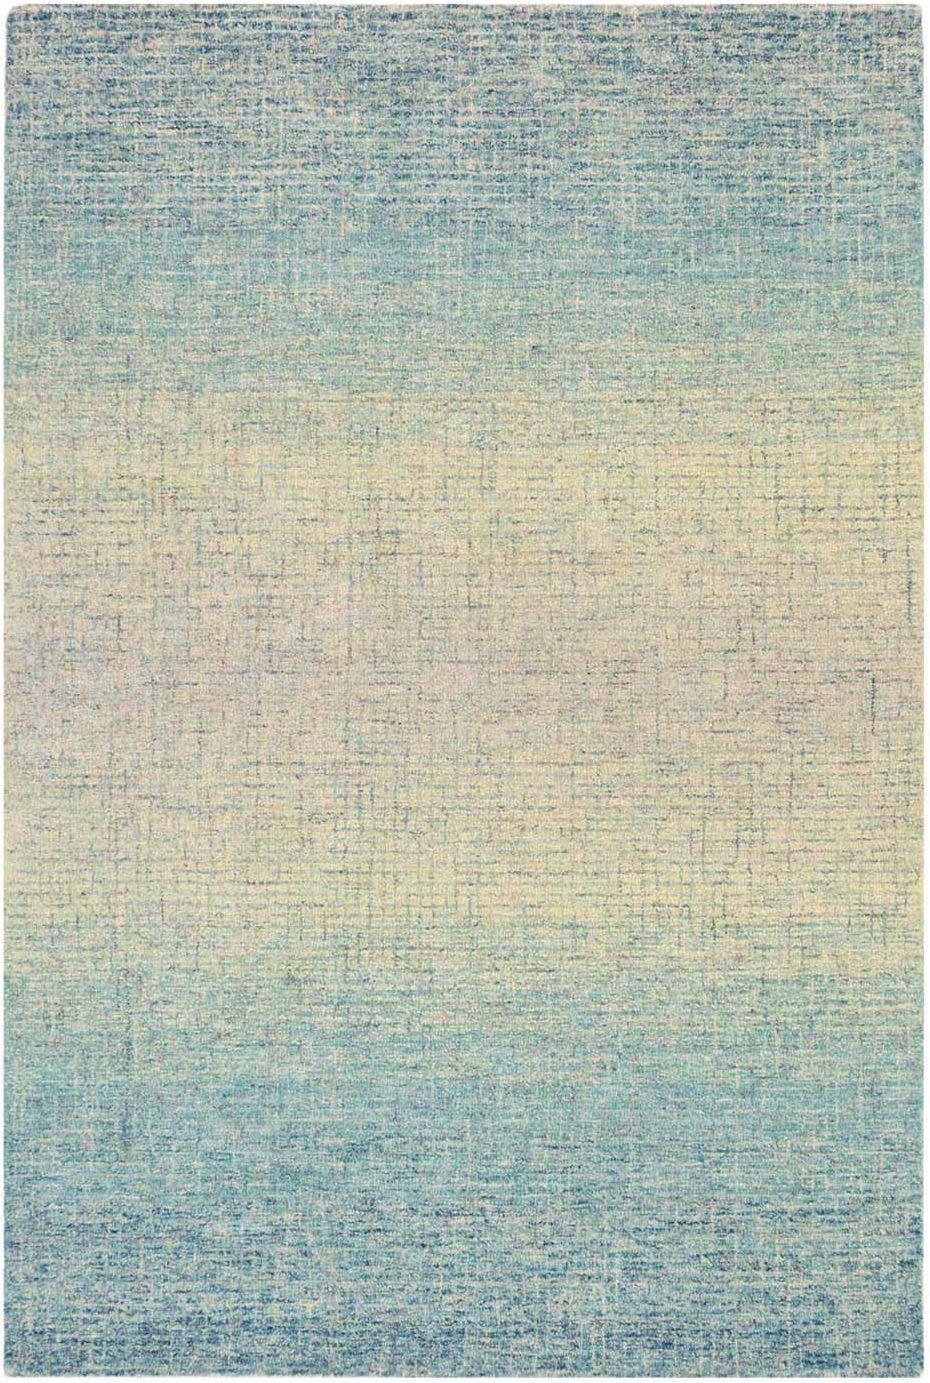 Trans-Ocean Savannah Horizon 951044